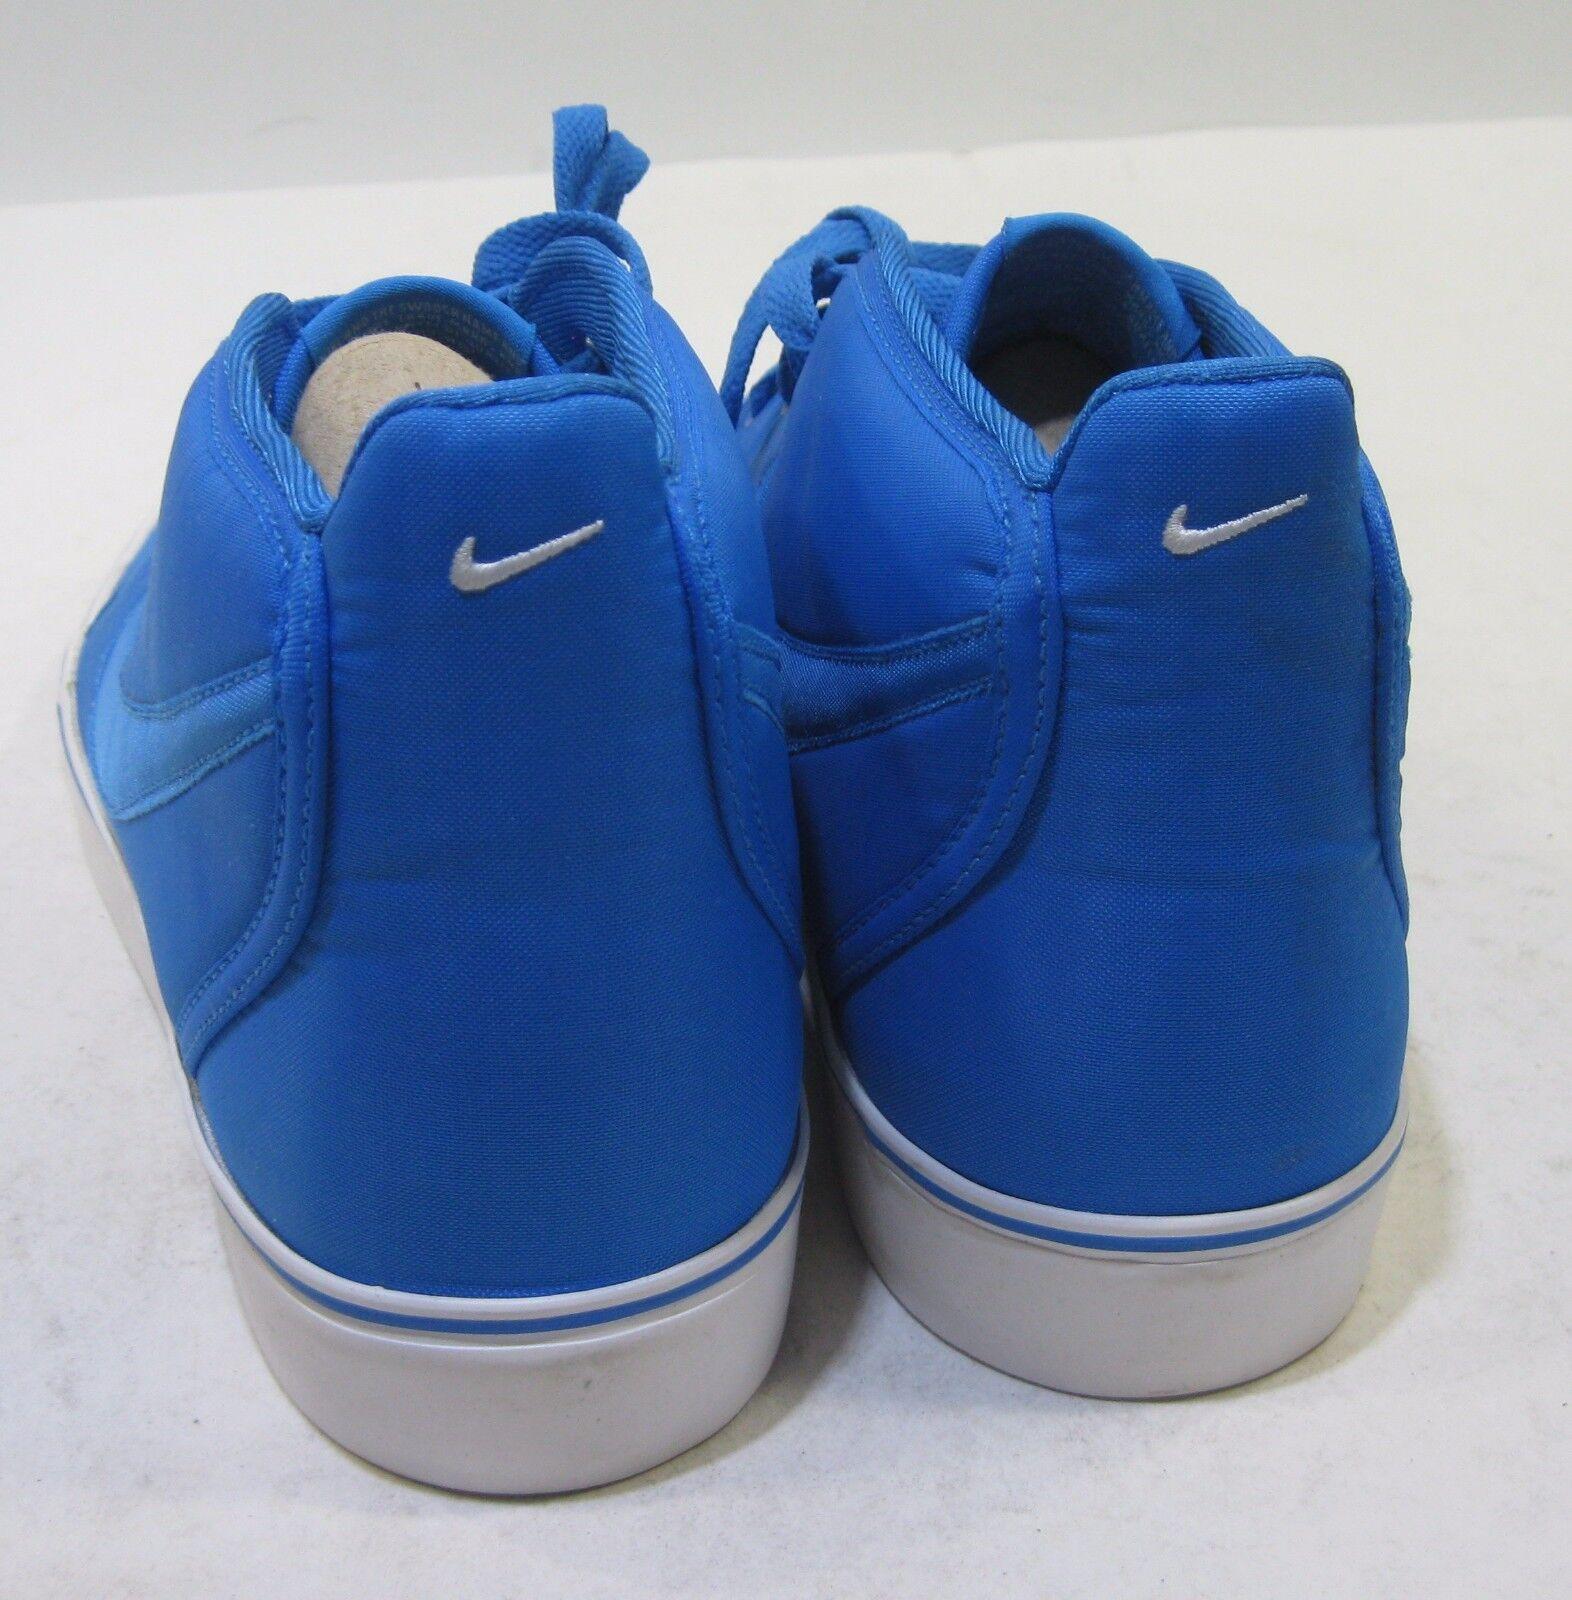 Nike - gipfel Turnschuhe in blau / toki mens pilot gipfel - weiß 385444-403 größe. dd378b